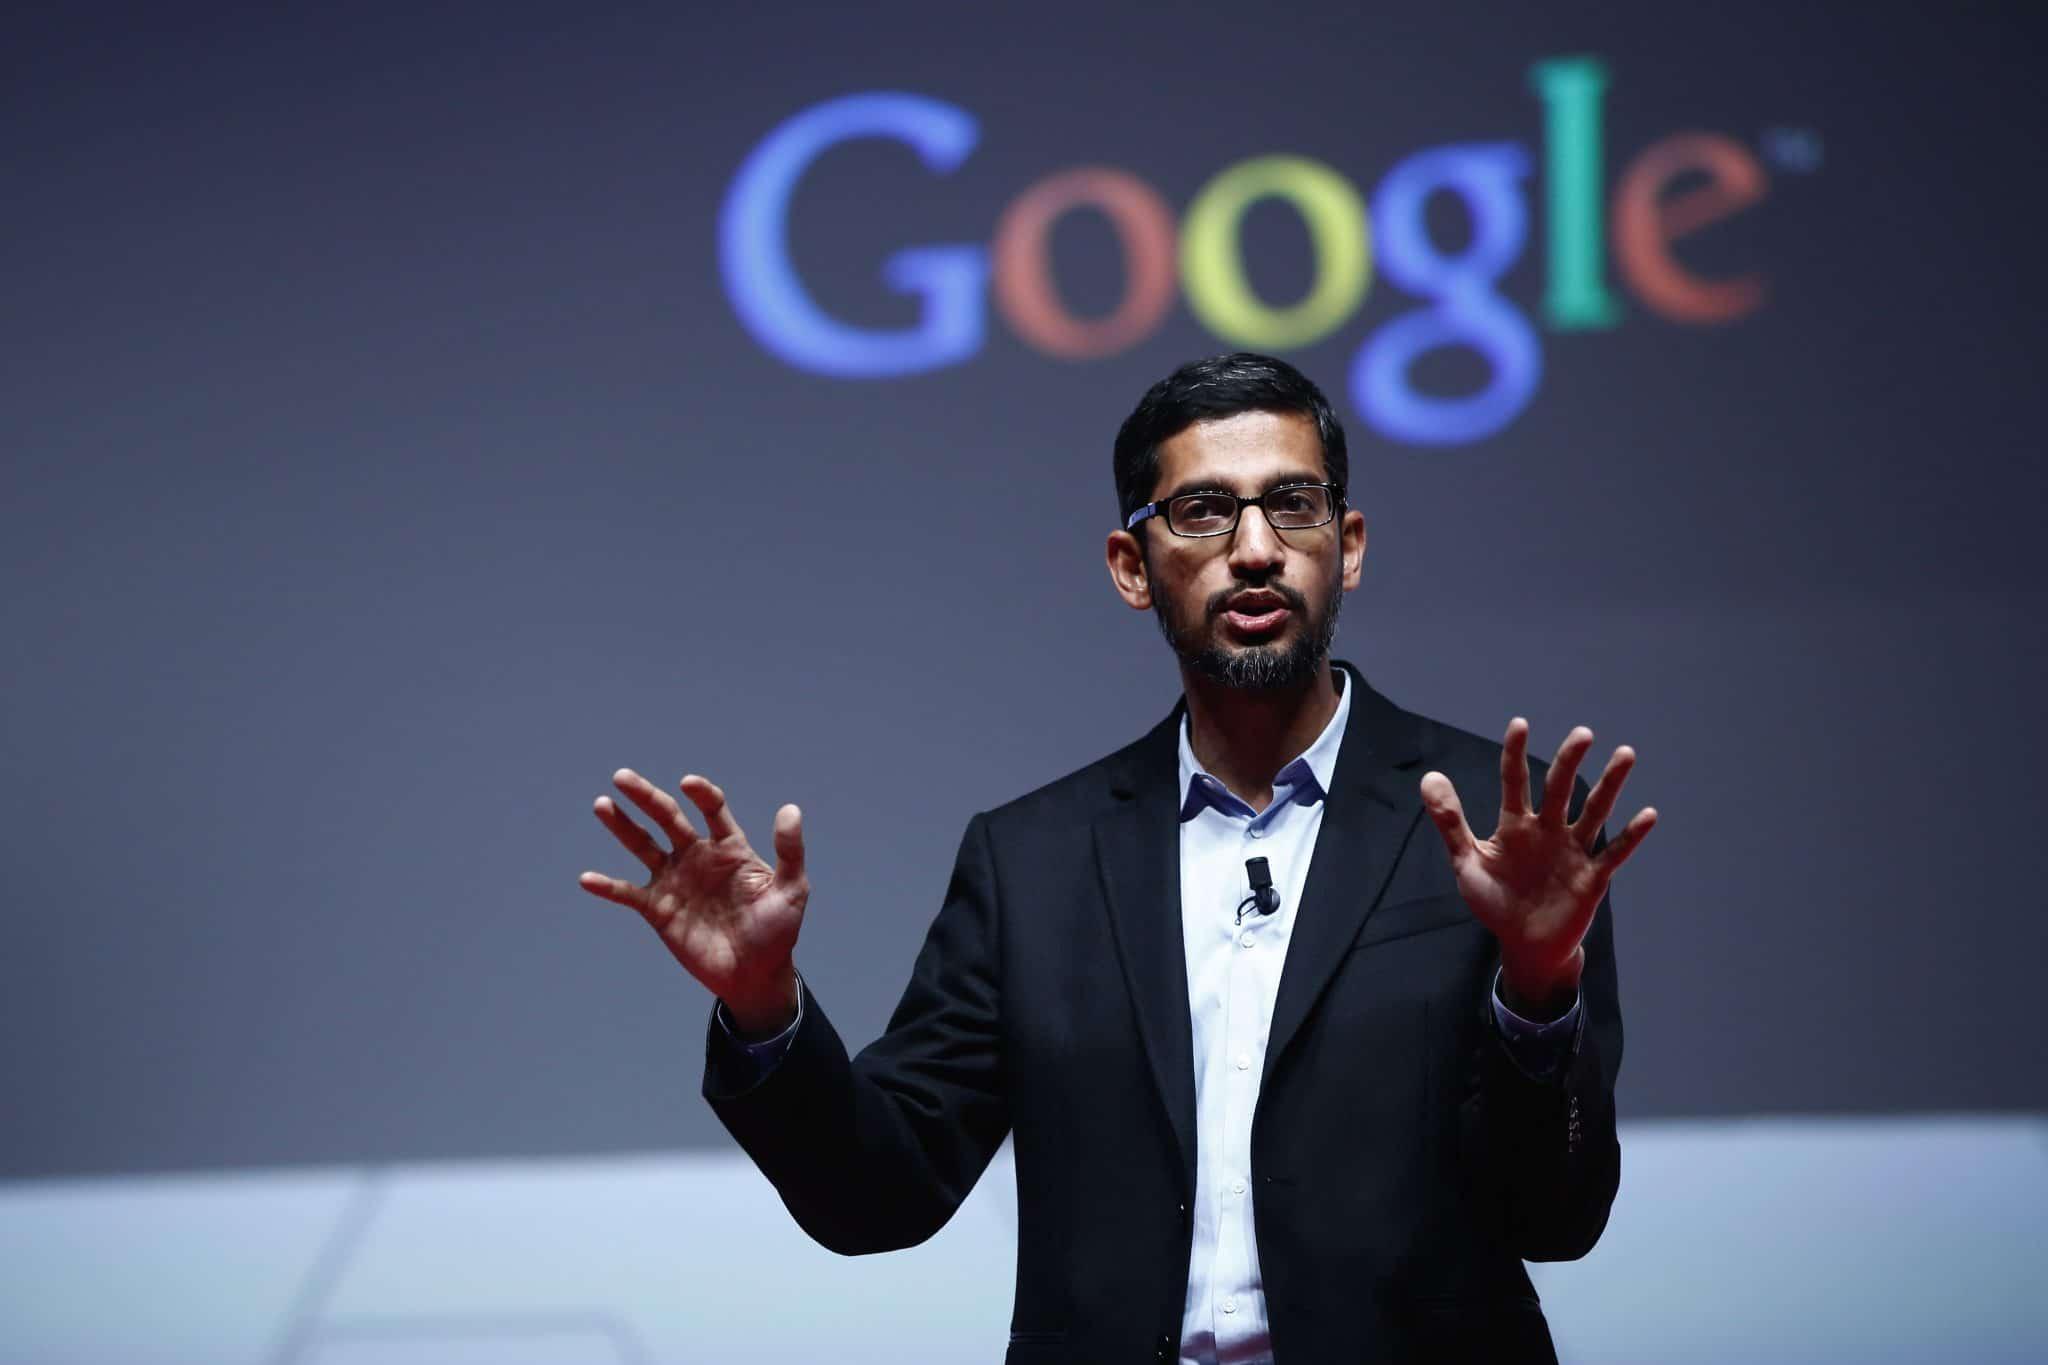 Google تنفي اشاعات عن اتاحة خدماتها في الصين 1